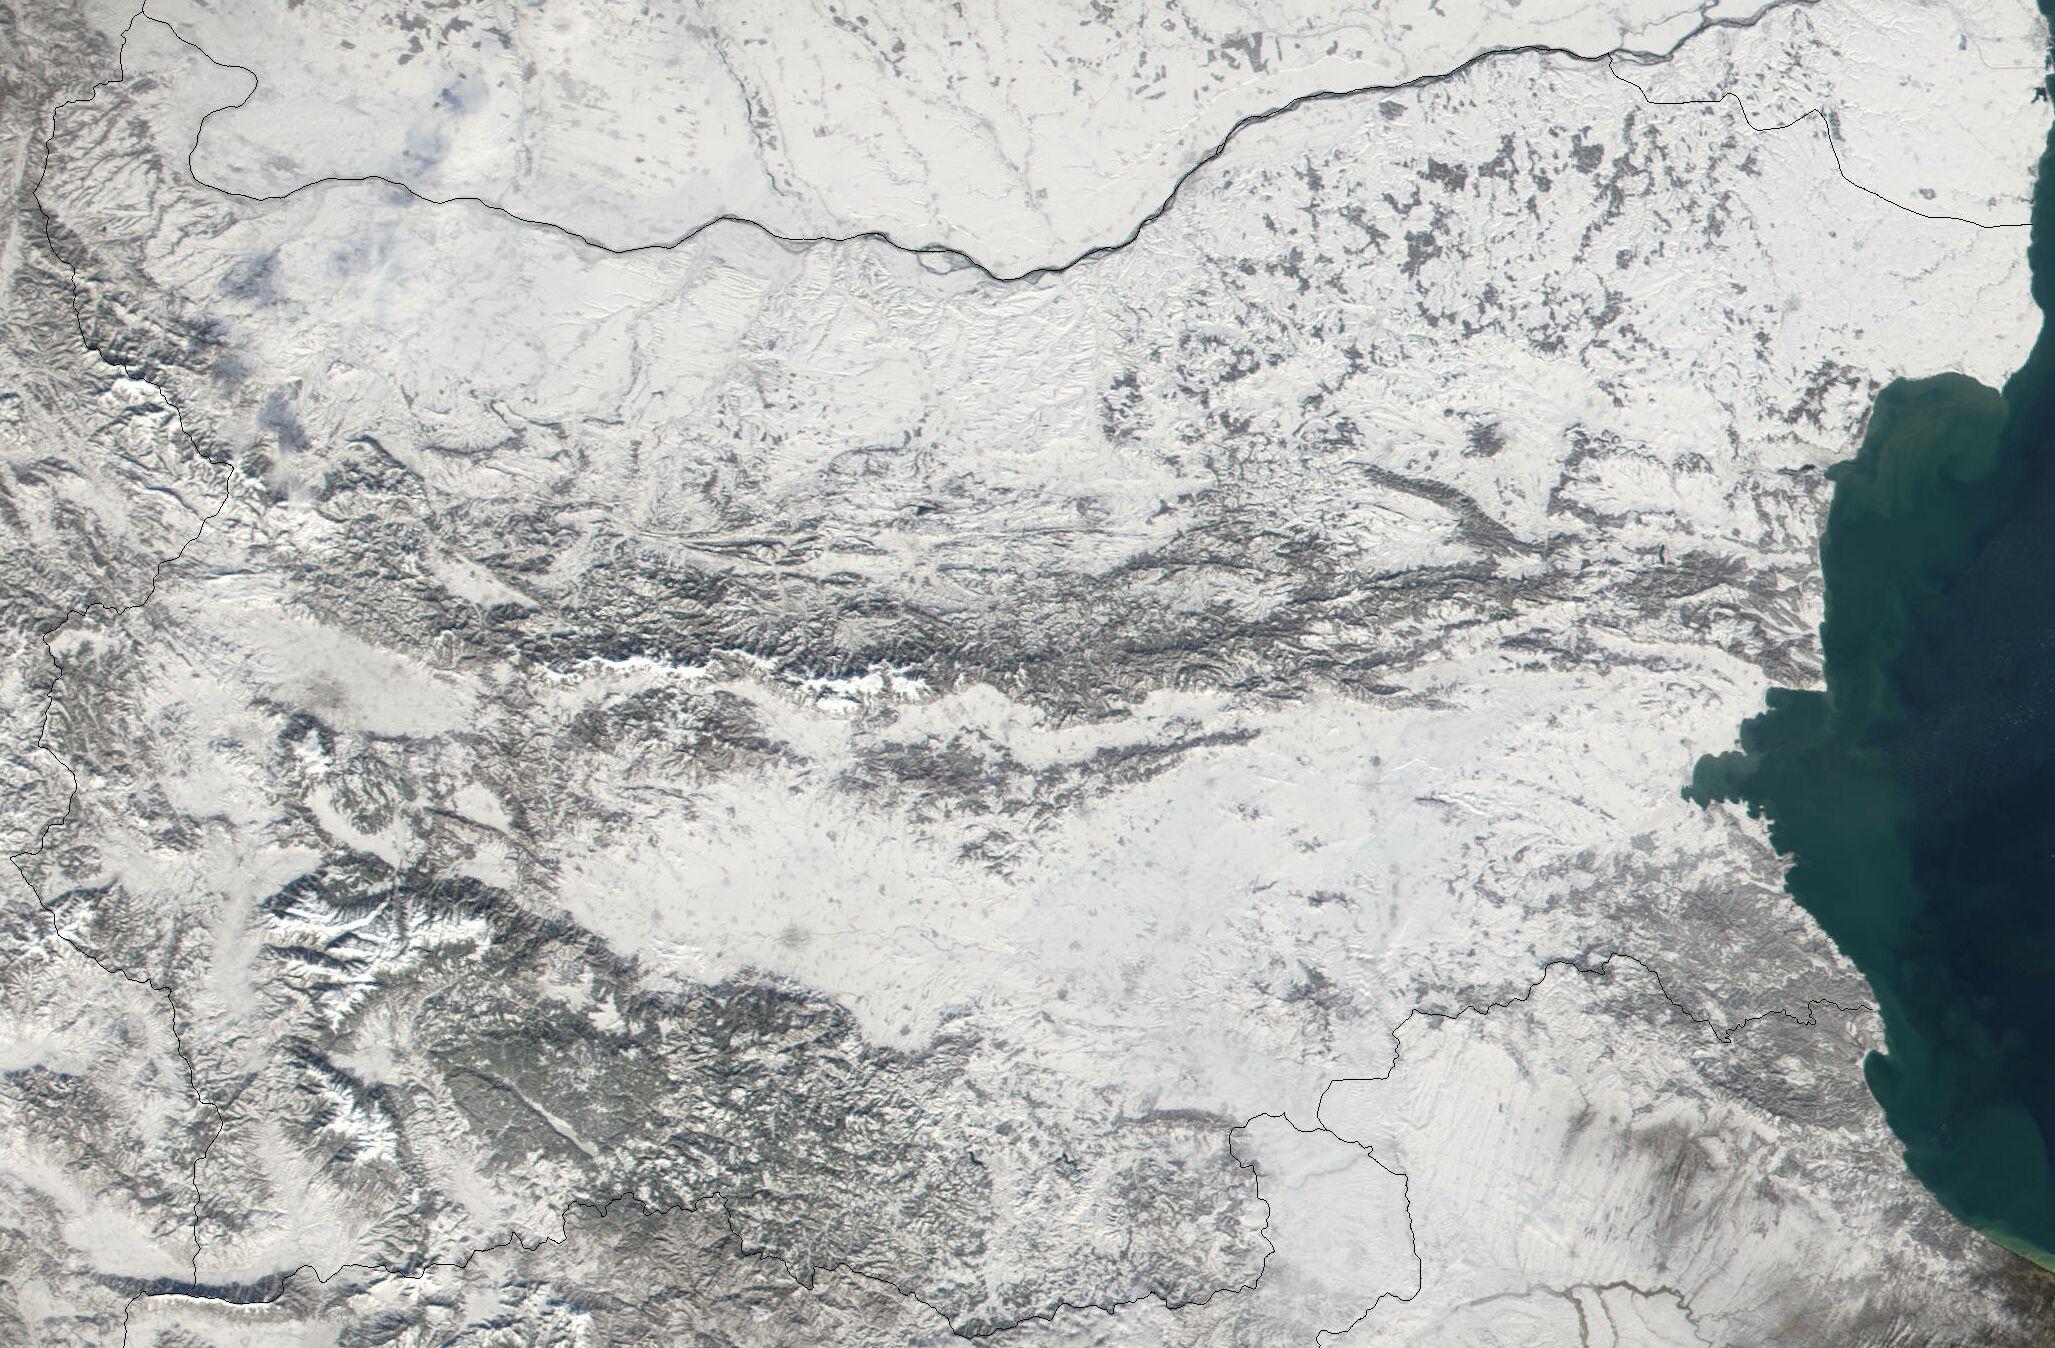 FileSatellite Image Of Bulgaria In December Jpg Wikimedia - Satellite height map